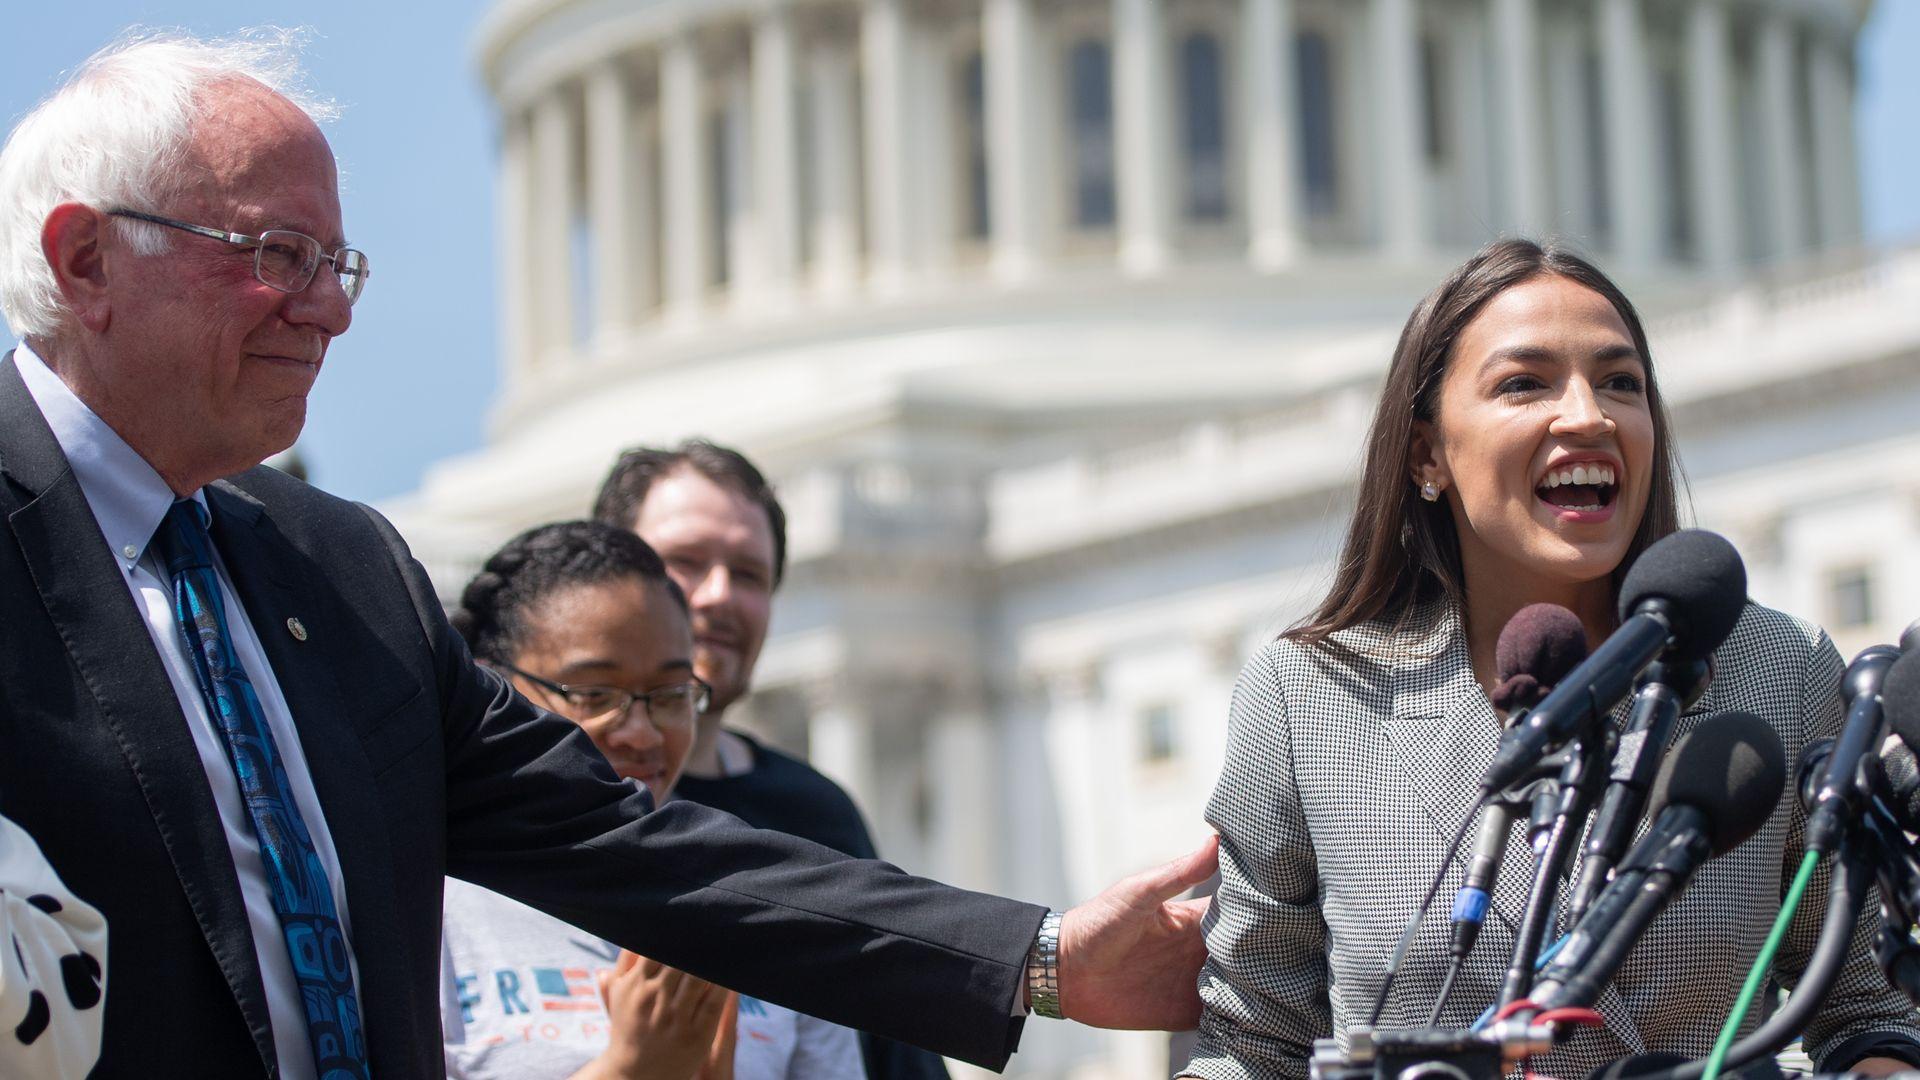 Representative Alexandria Ocasio-Cortez (2nd R), Democrat of New York, speaks alongside US Senator Bernie Sanders (2nd L), Independent of Vermont